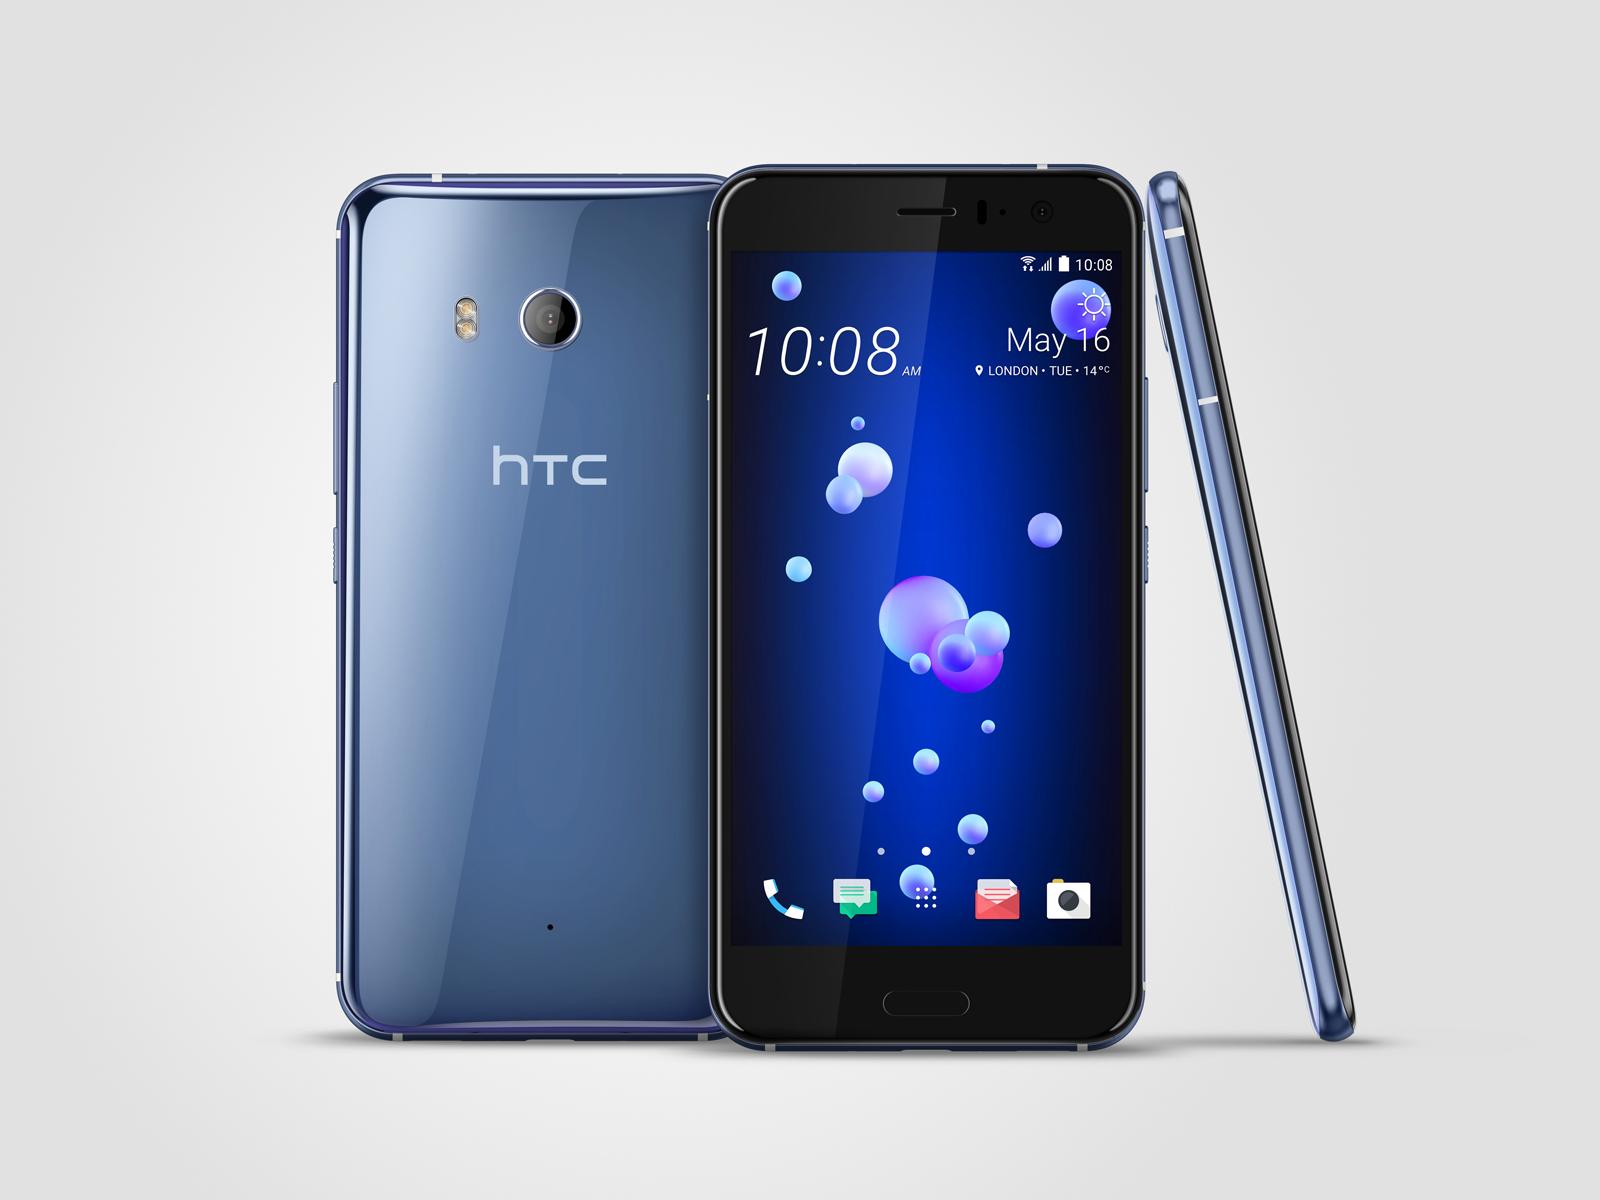 Ízig-vérig csúcsmodell a HTC U 11